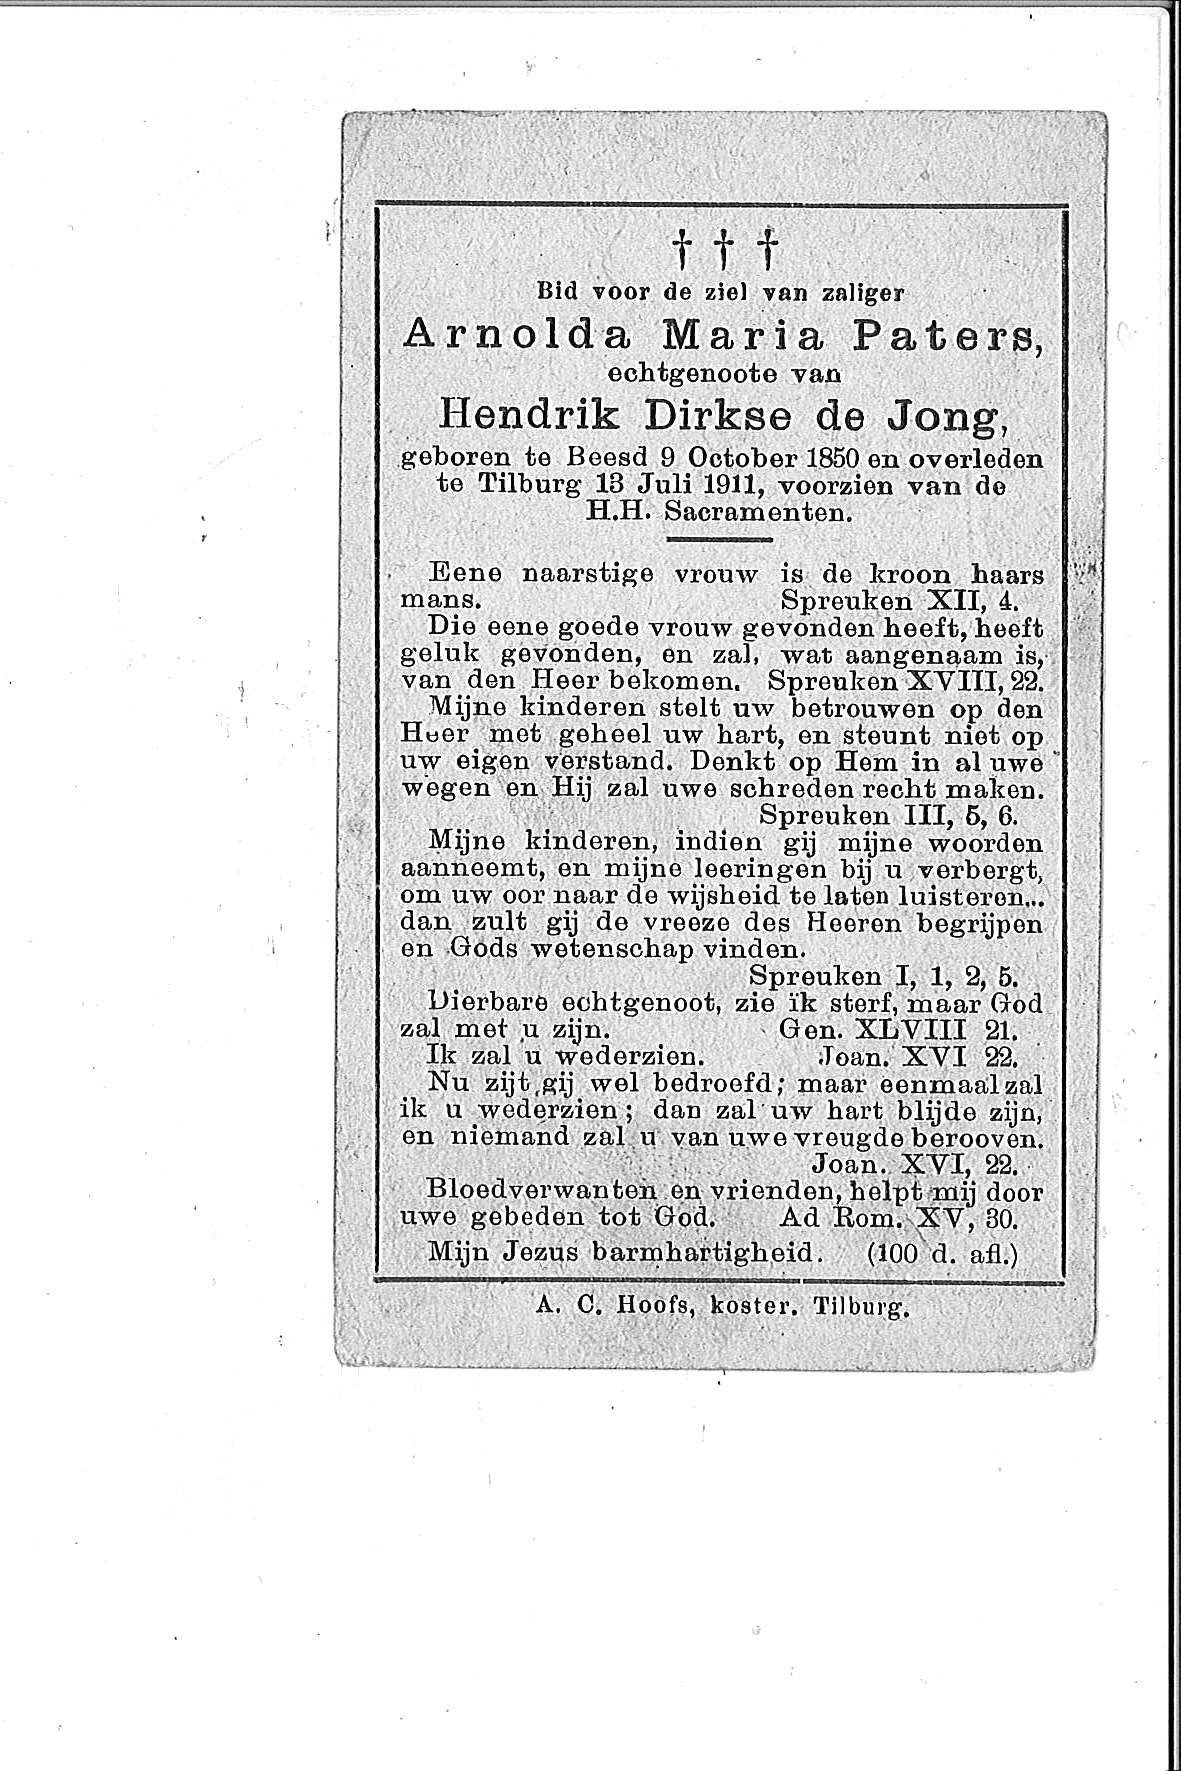 Arnolda-Maria(1911)20150112130238_00070.jpg